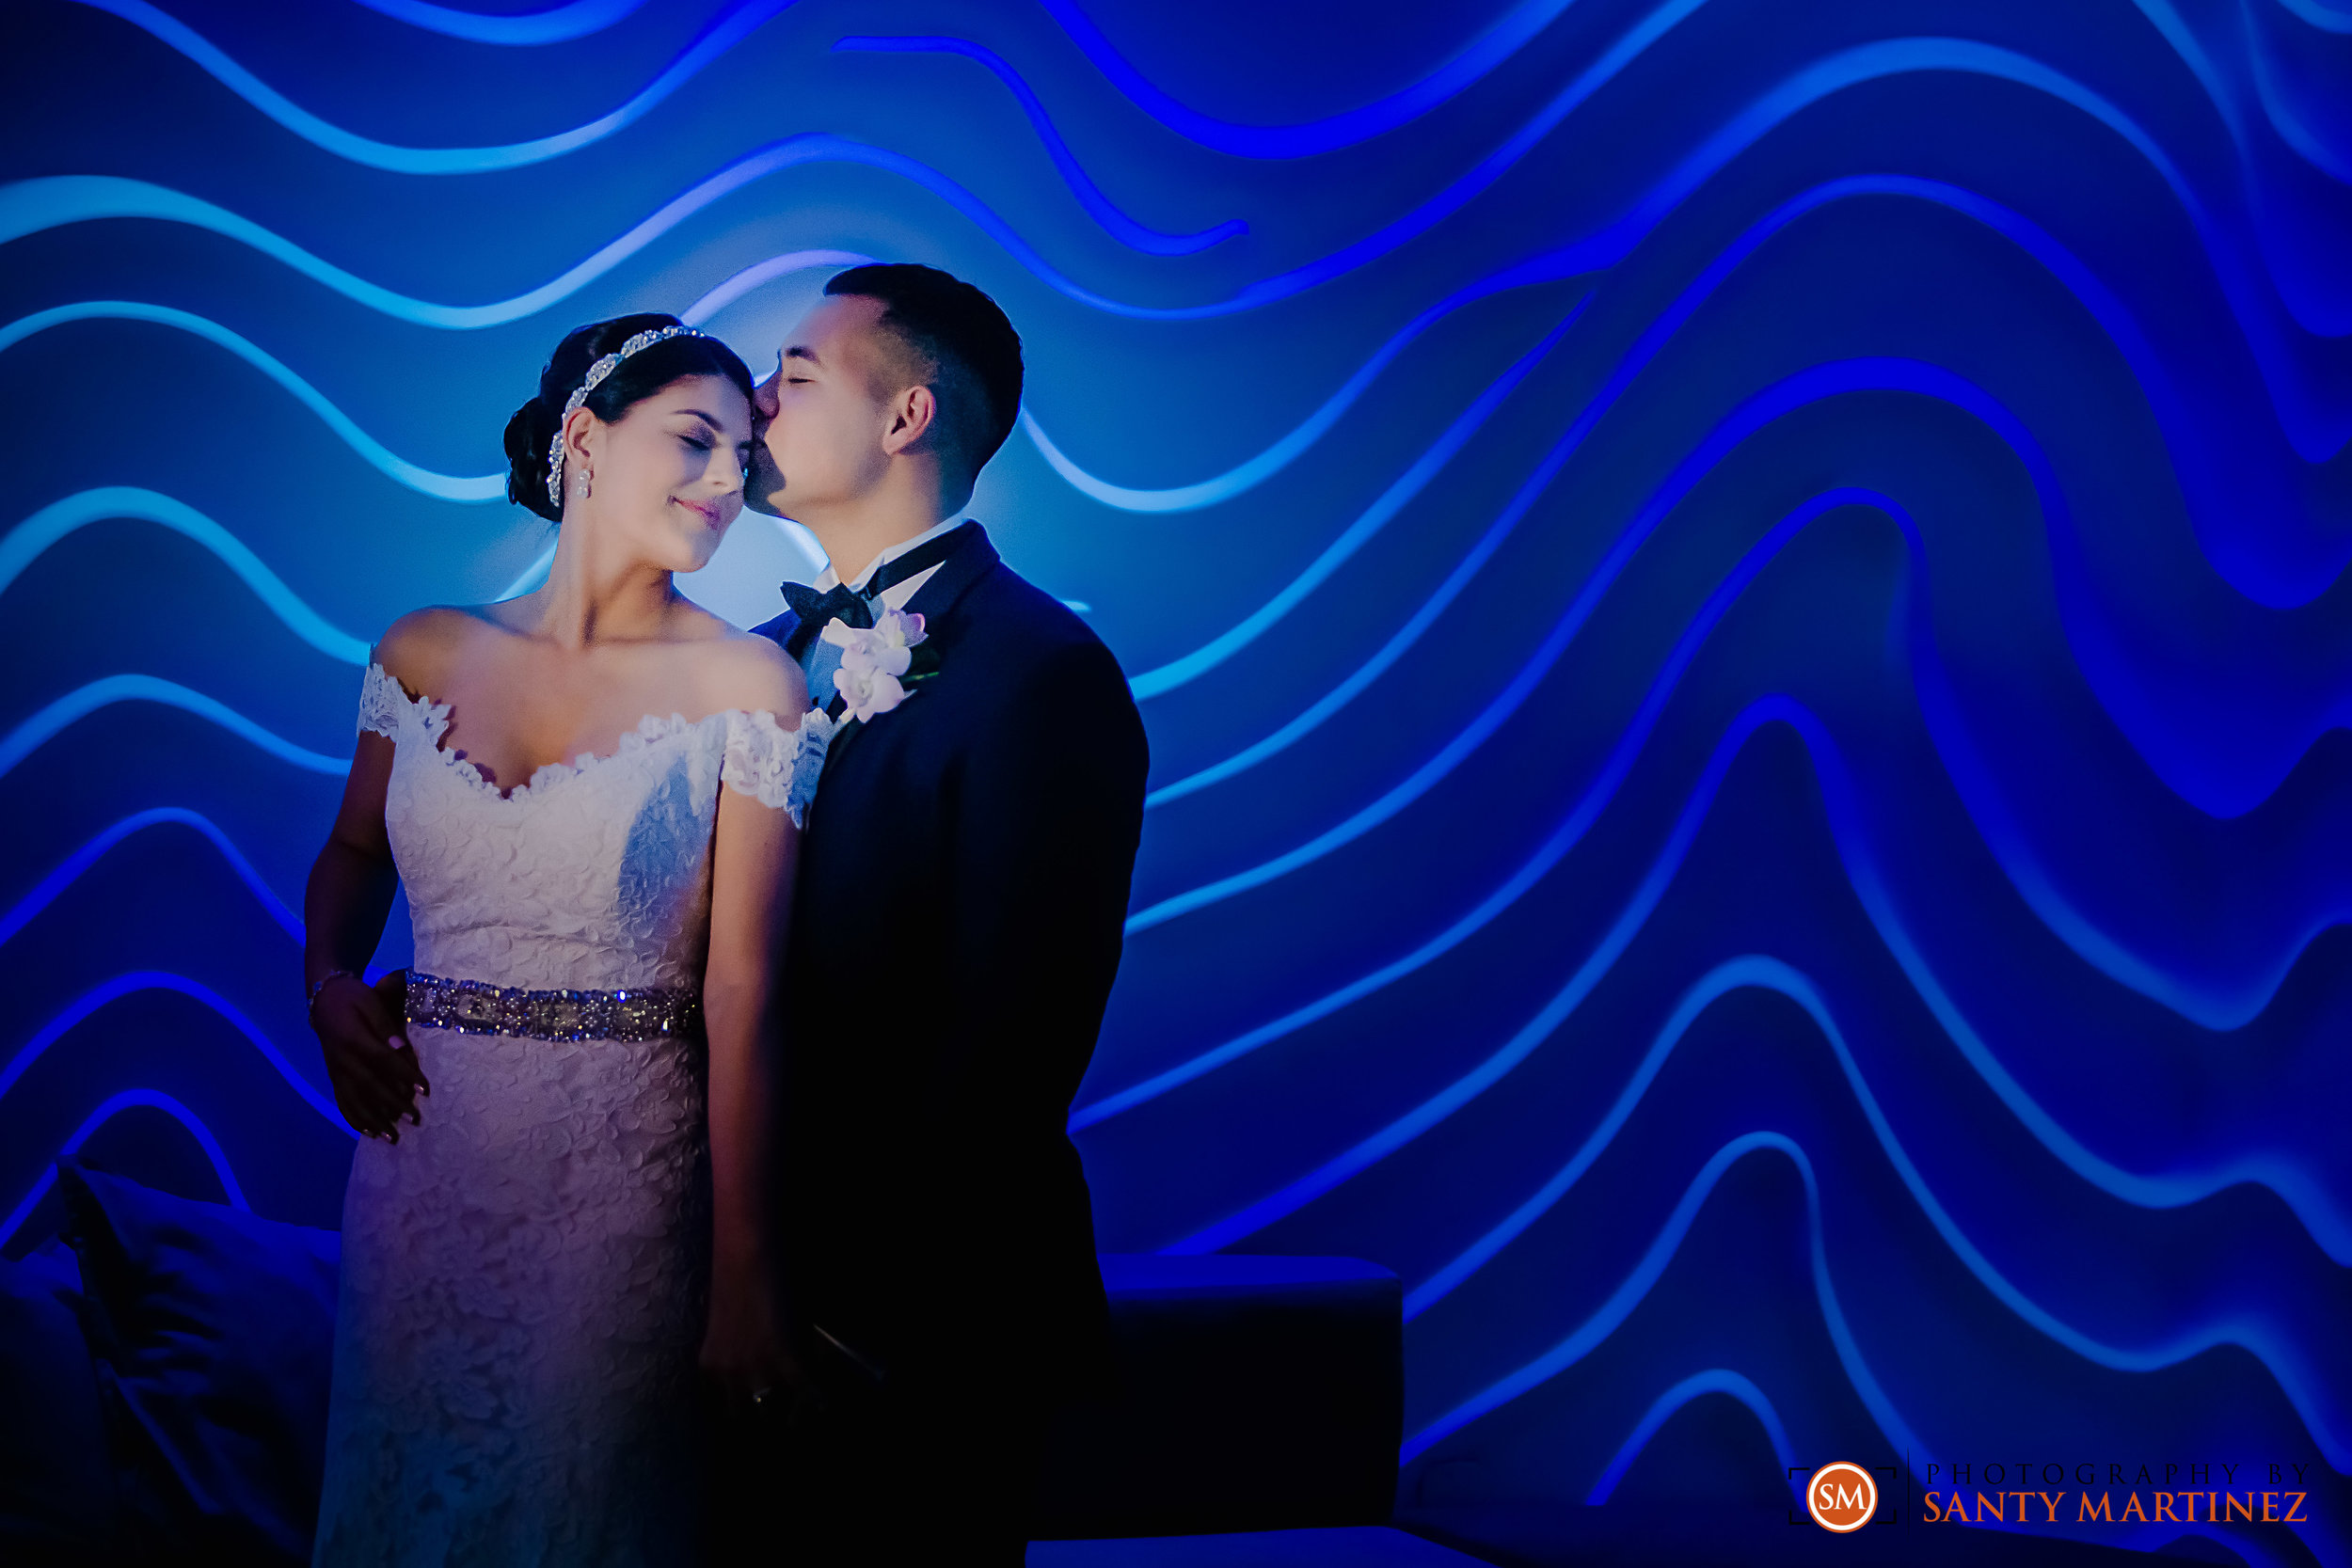 Miami Wedding Photographer - Santy Martinez-28.jpg